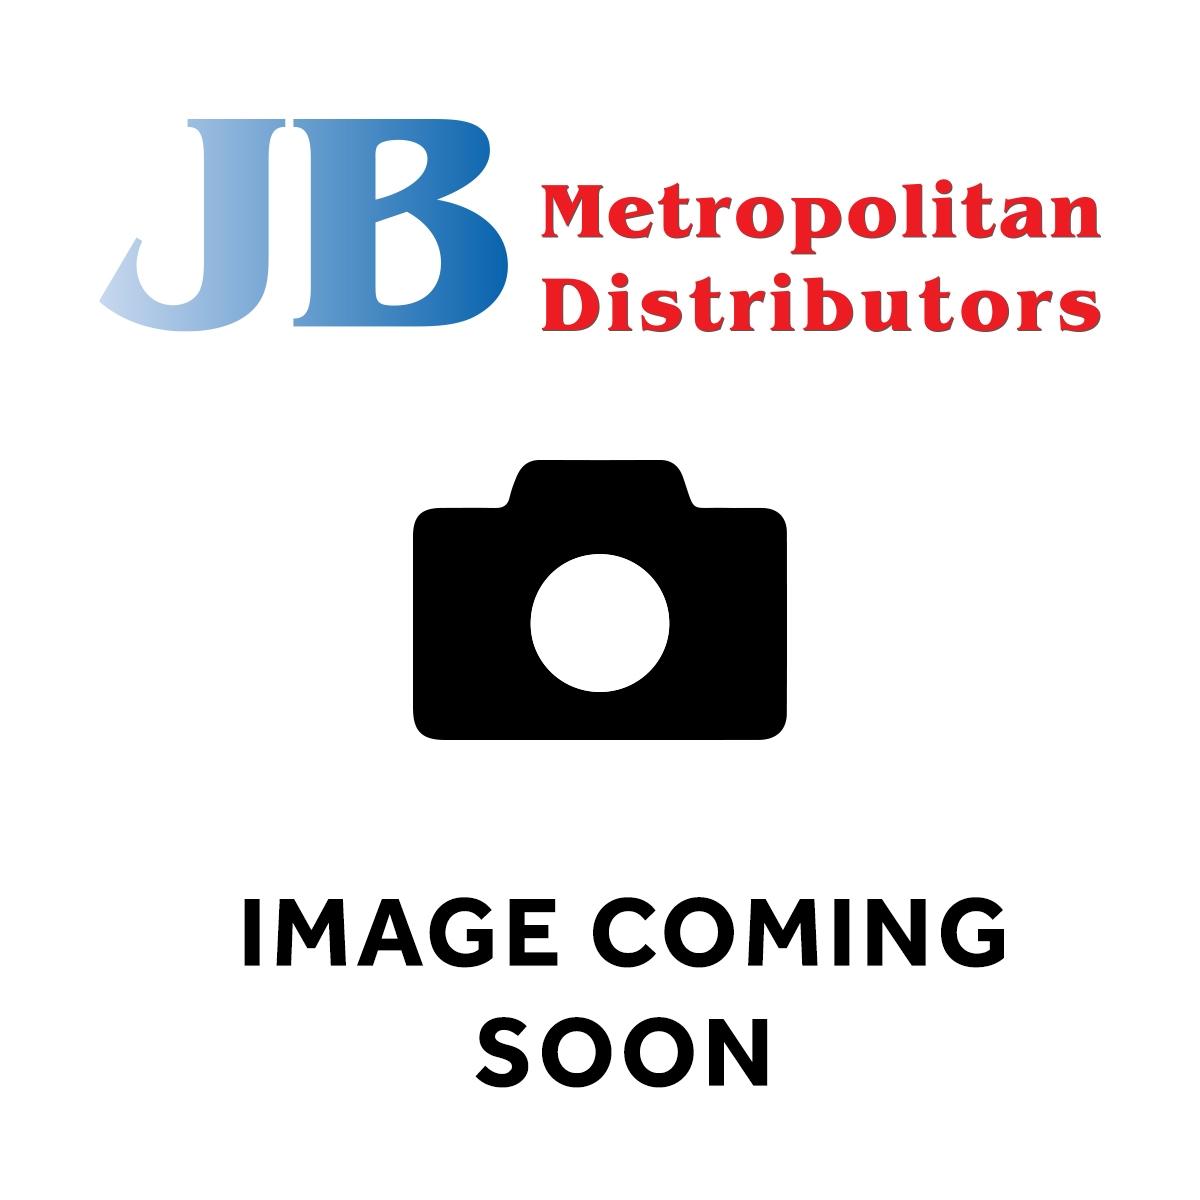 120G PECKISH MULTI-BAG CHEDDAR CHEESE